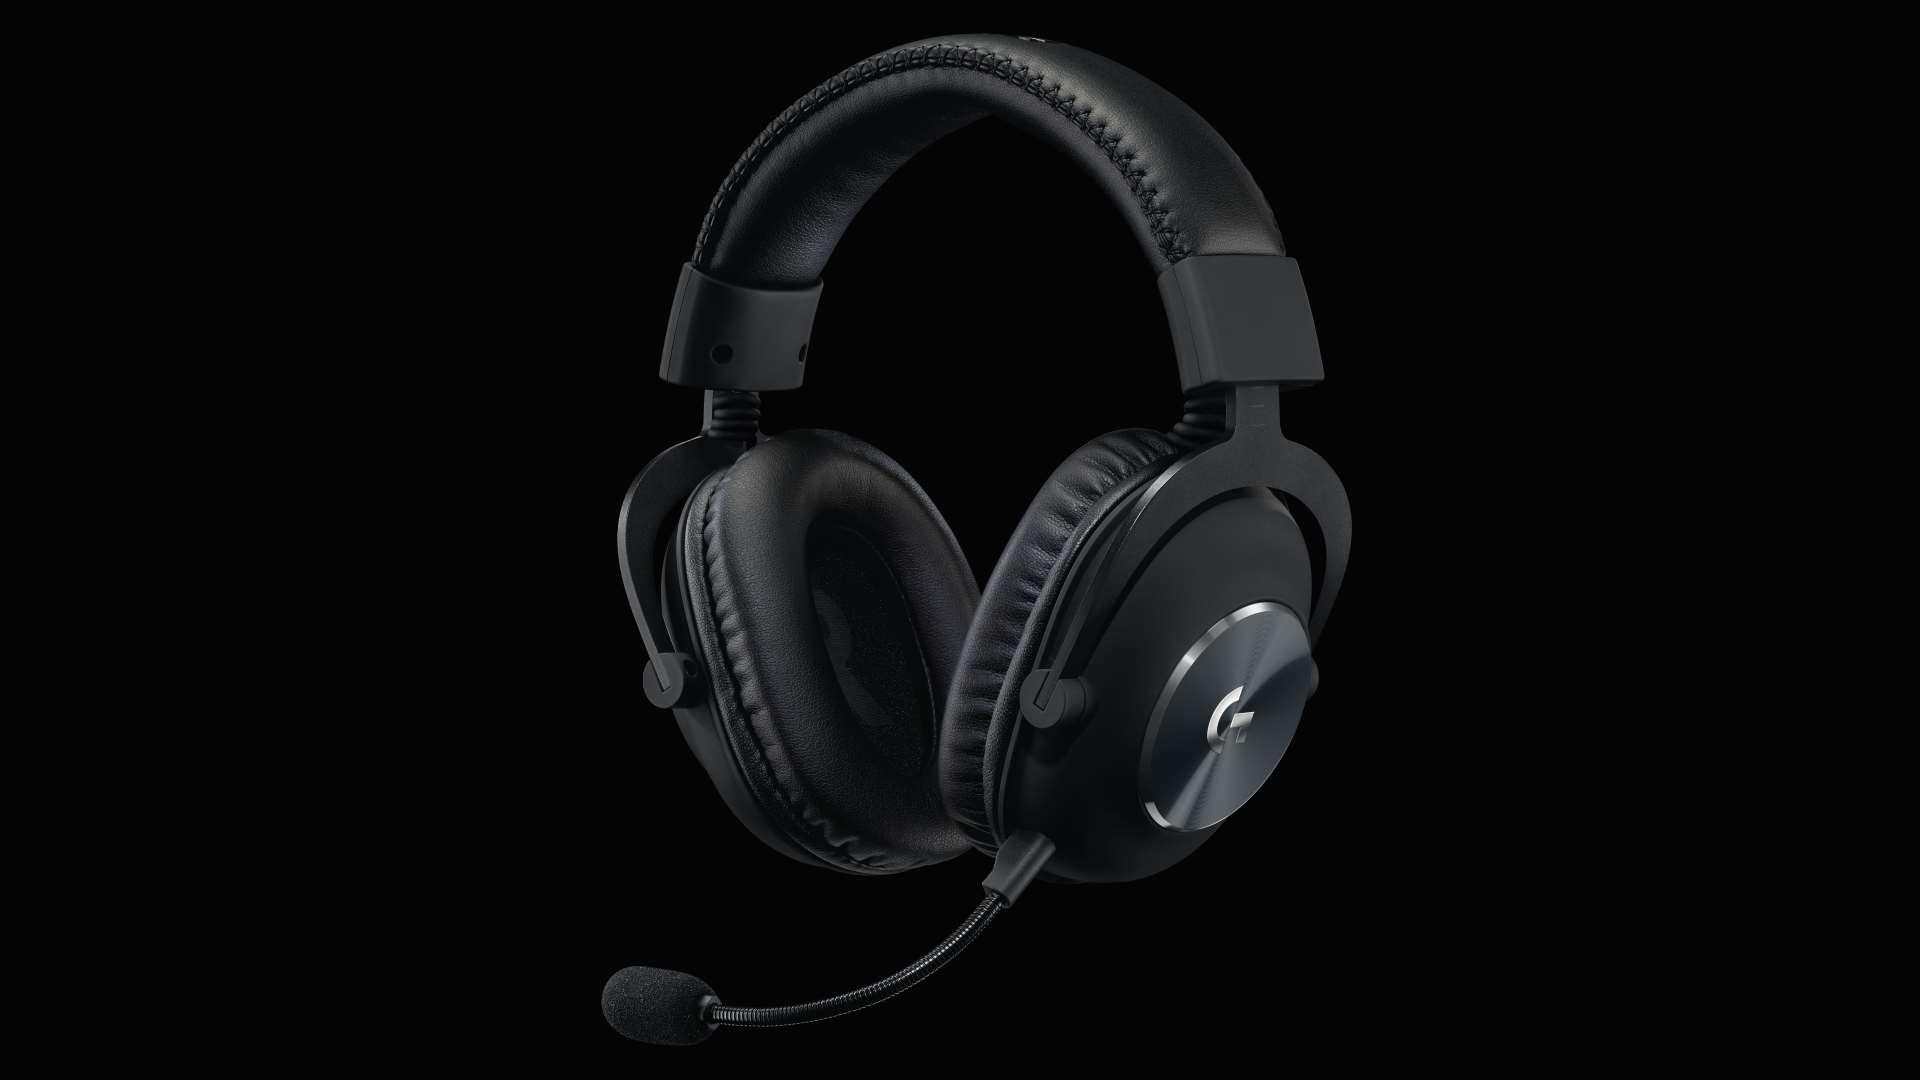 Logitech G Pro X gaming headset review: smart mic tech for